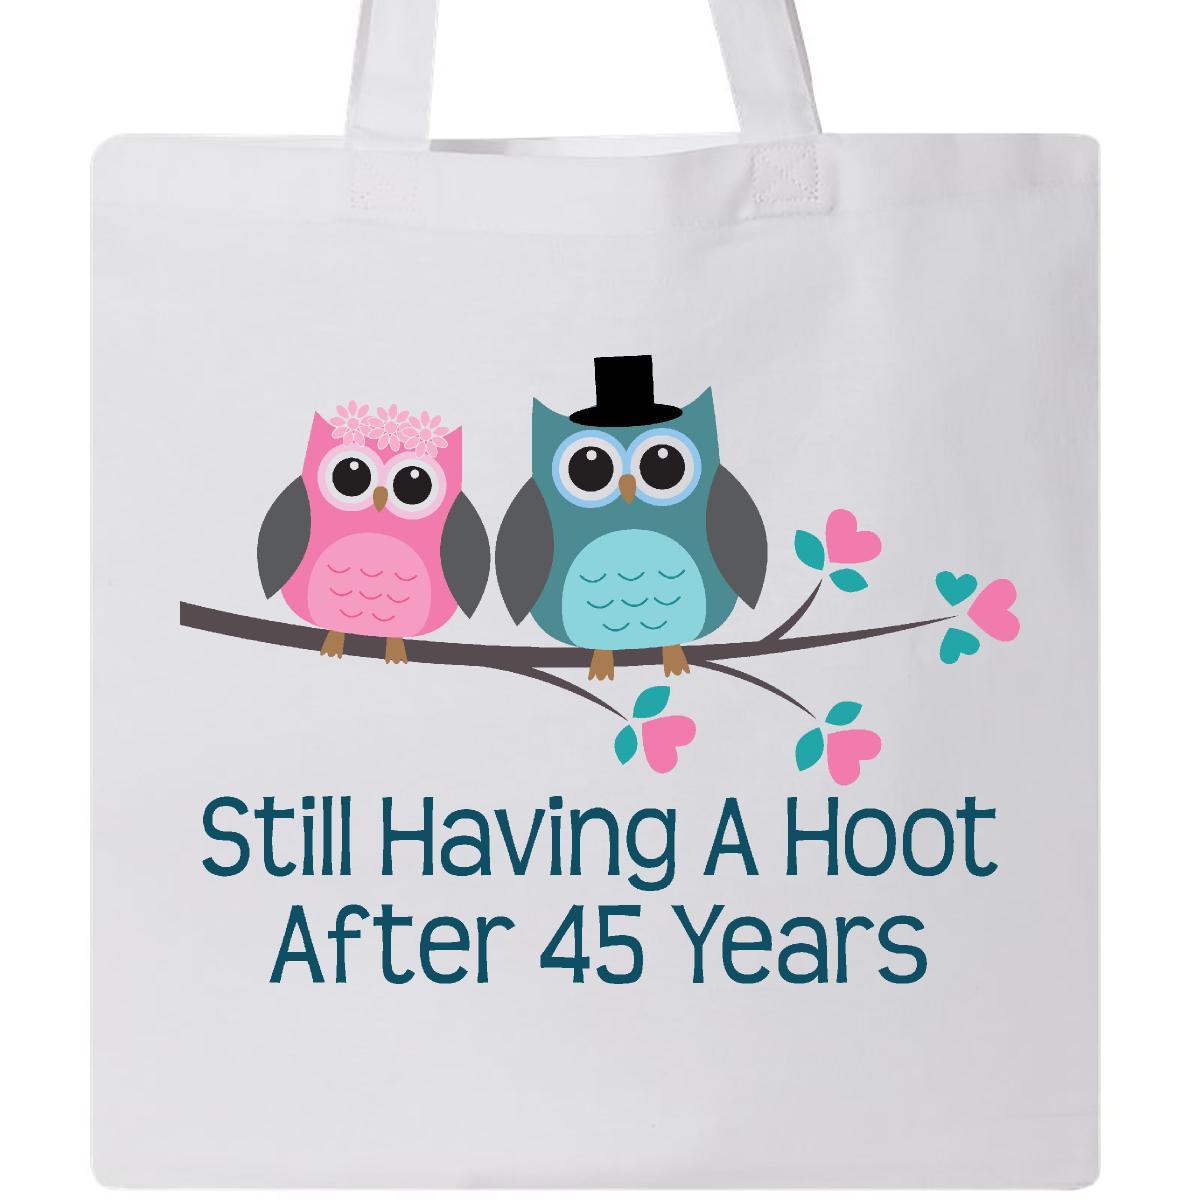 Gift For 45th Wedding Anniversary Hoot Tote Bag White 999 Weddinganniversarytshirts